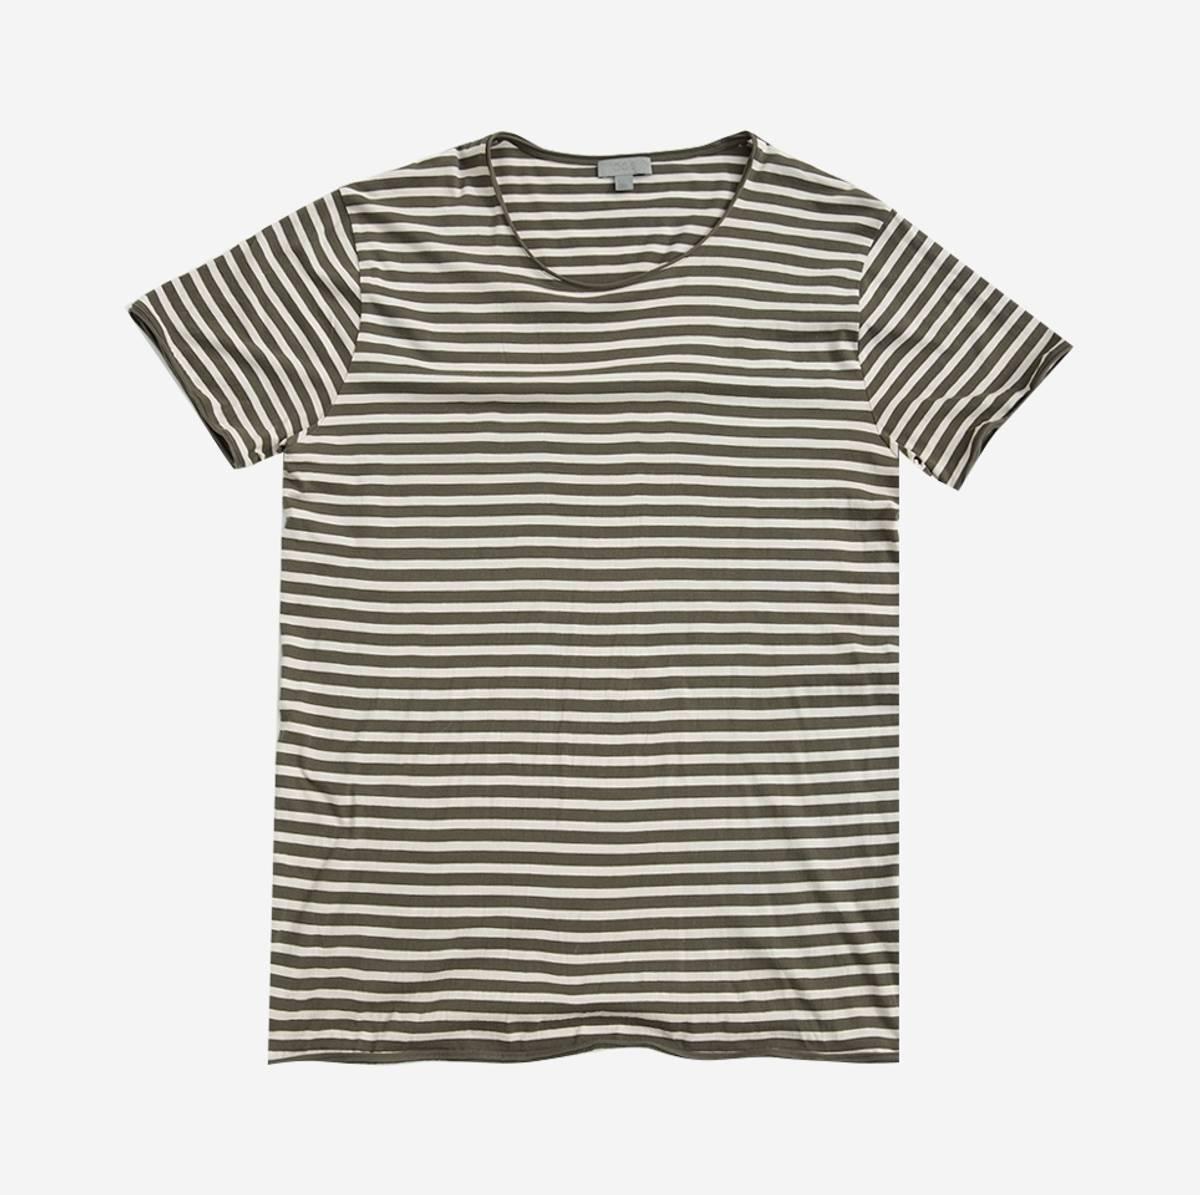 2b829eecec40 Cos 🔥 Cos Striped Rolled Hem Shirt 🔥